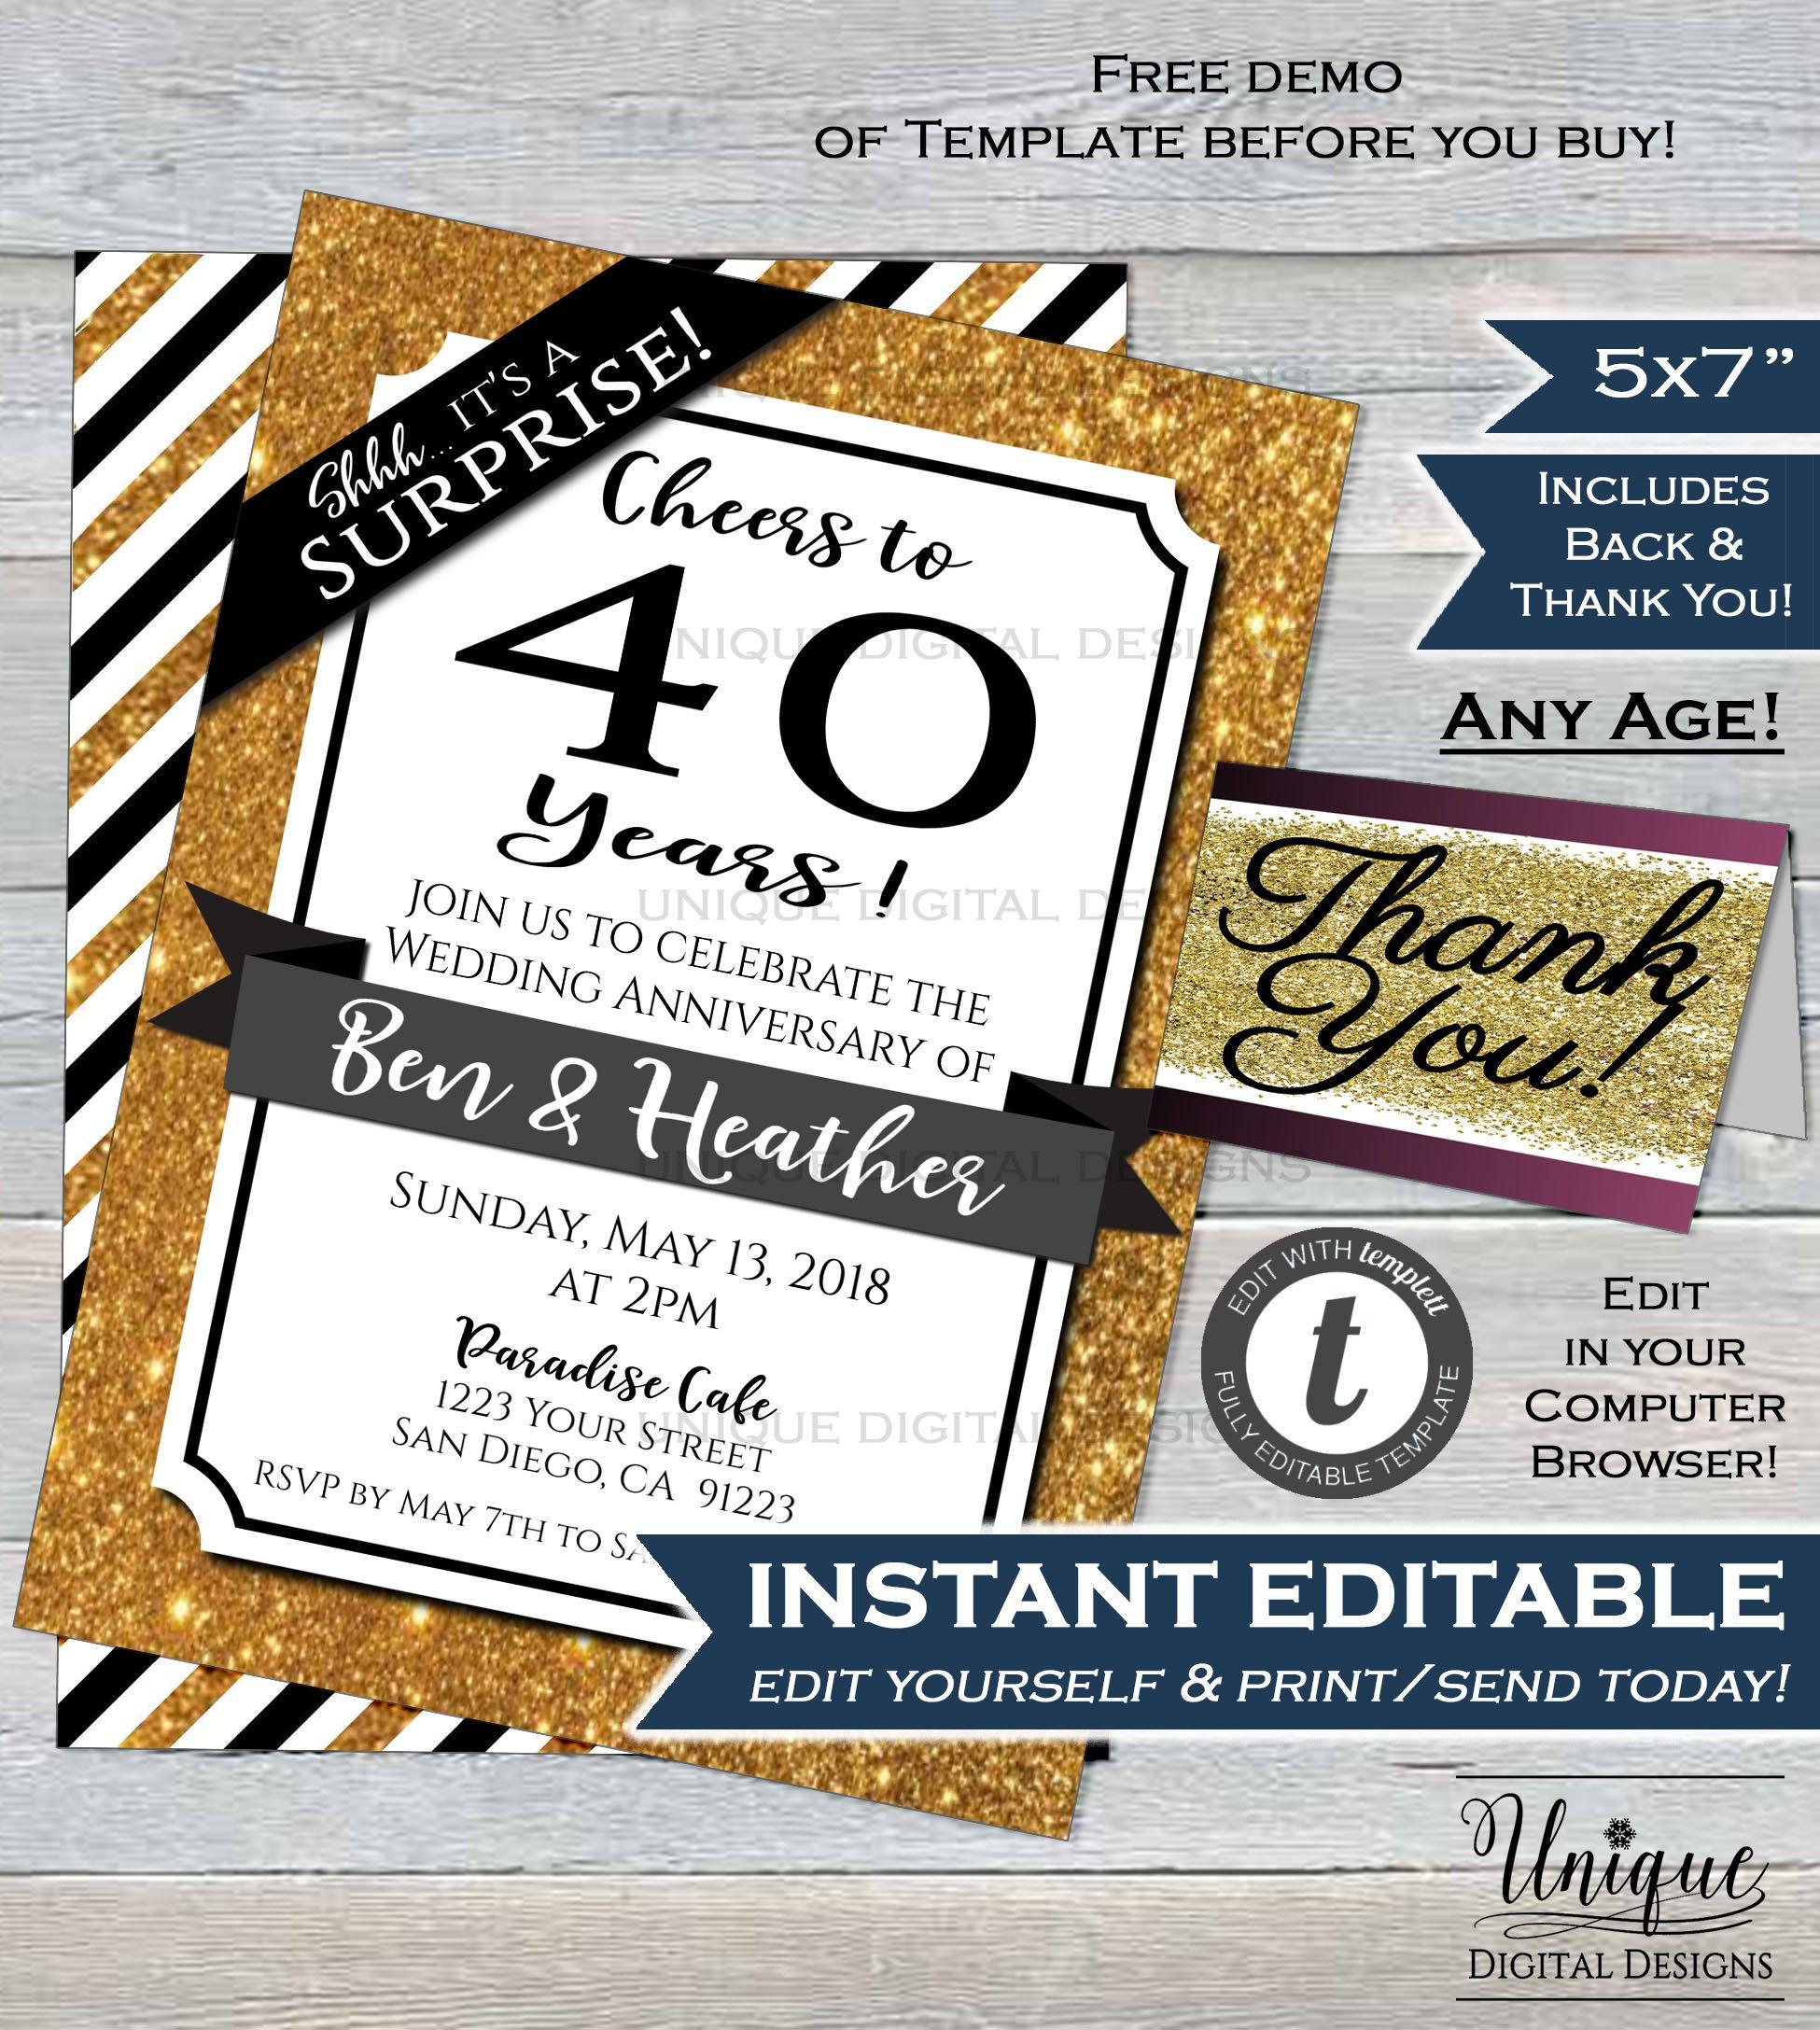 40Th Anniversary Invitation Fourtieth Wedding Anniversary Ruby | Etsy - Free Printable 40Th Anniversary Invitations